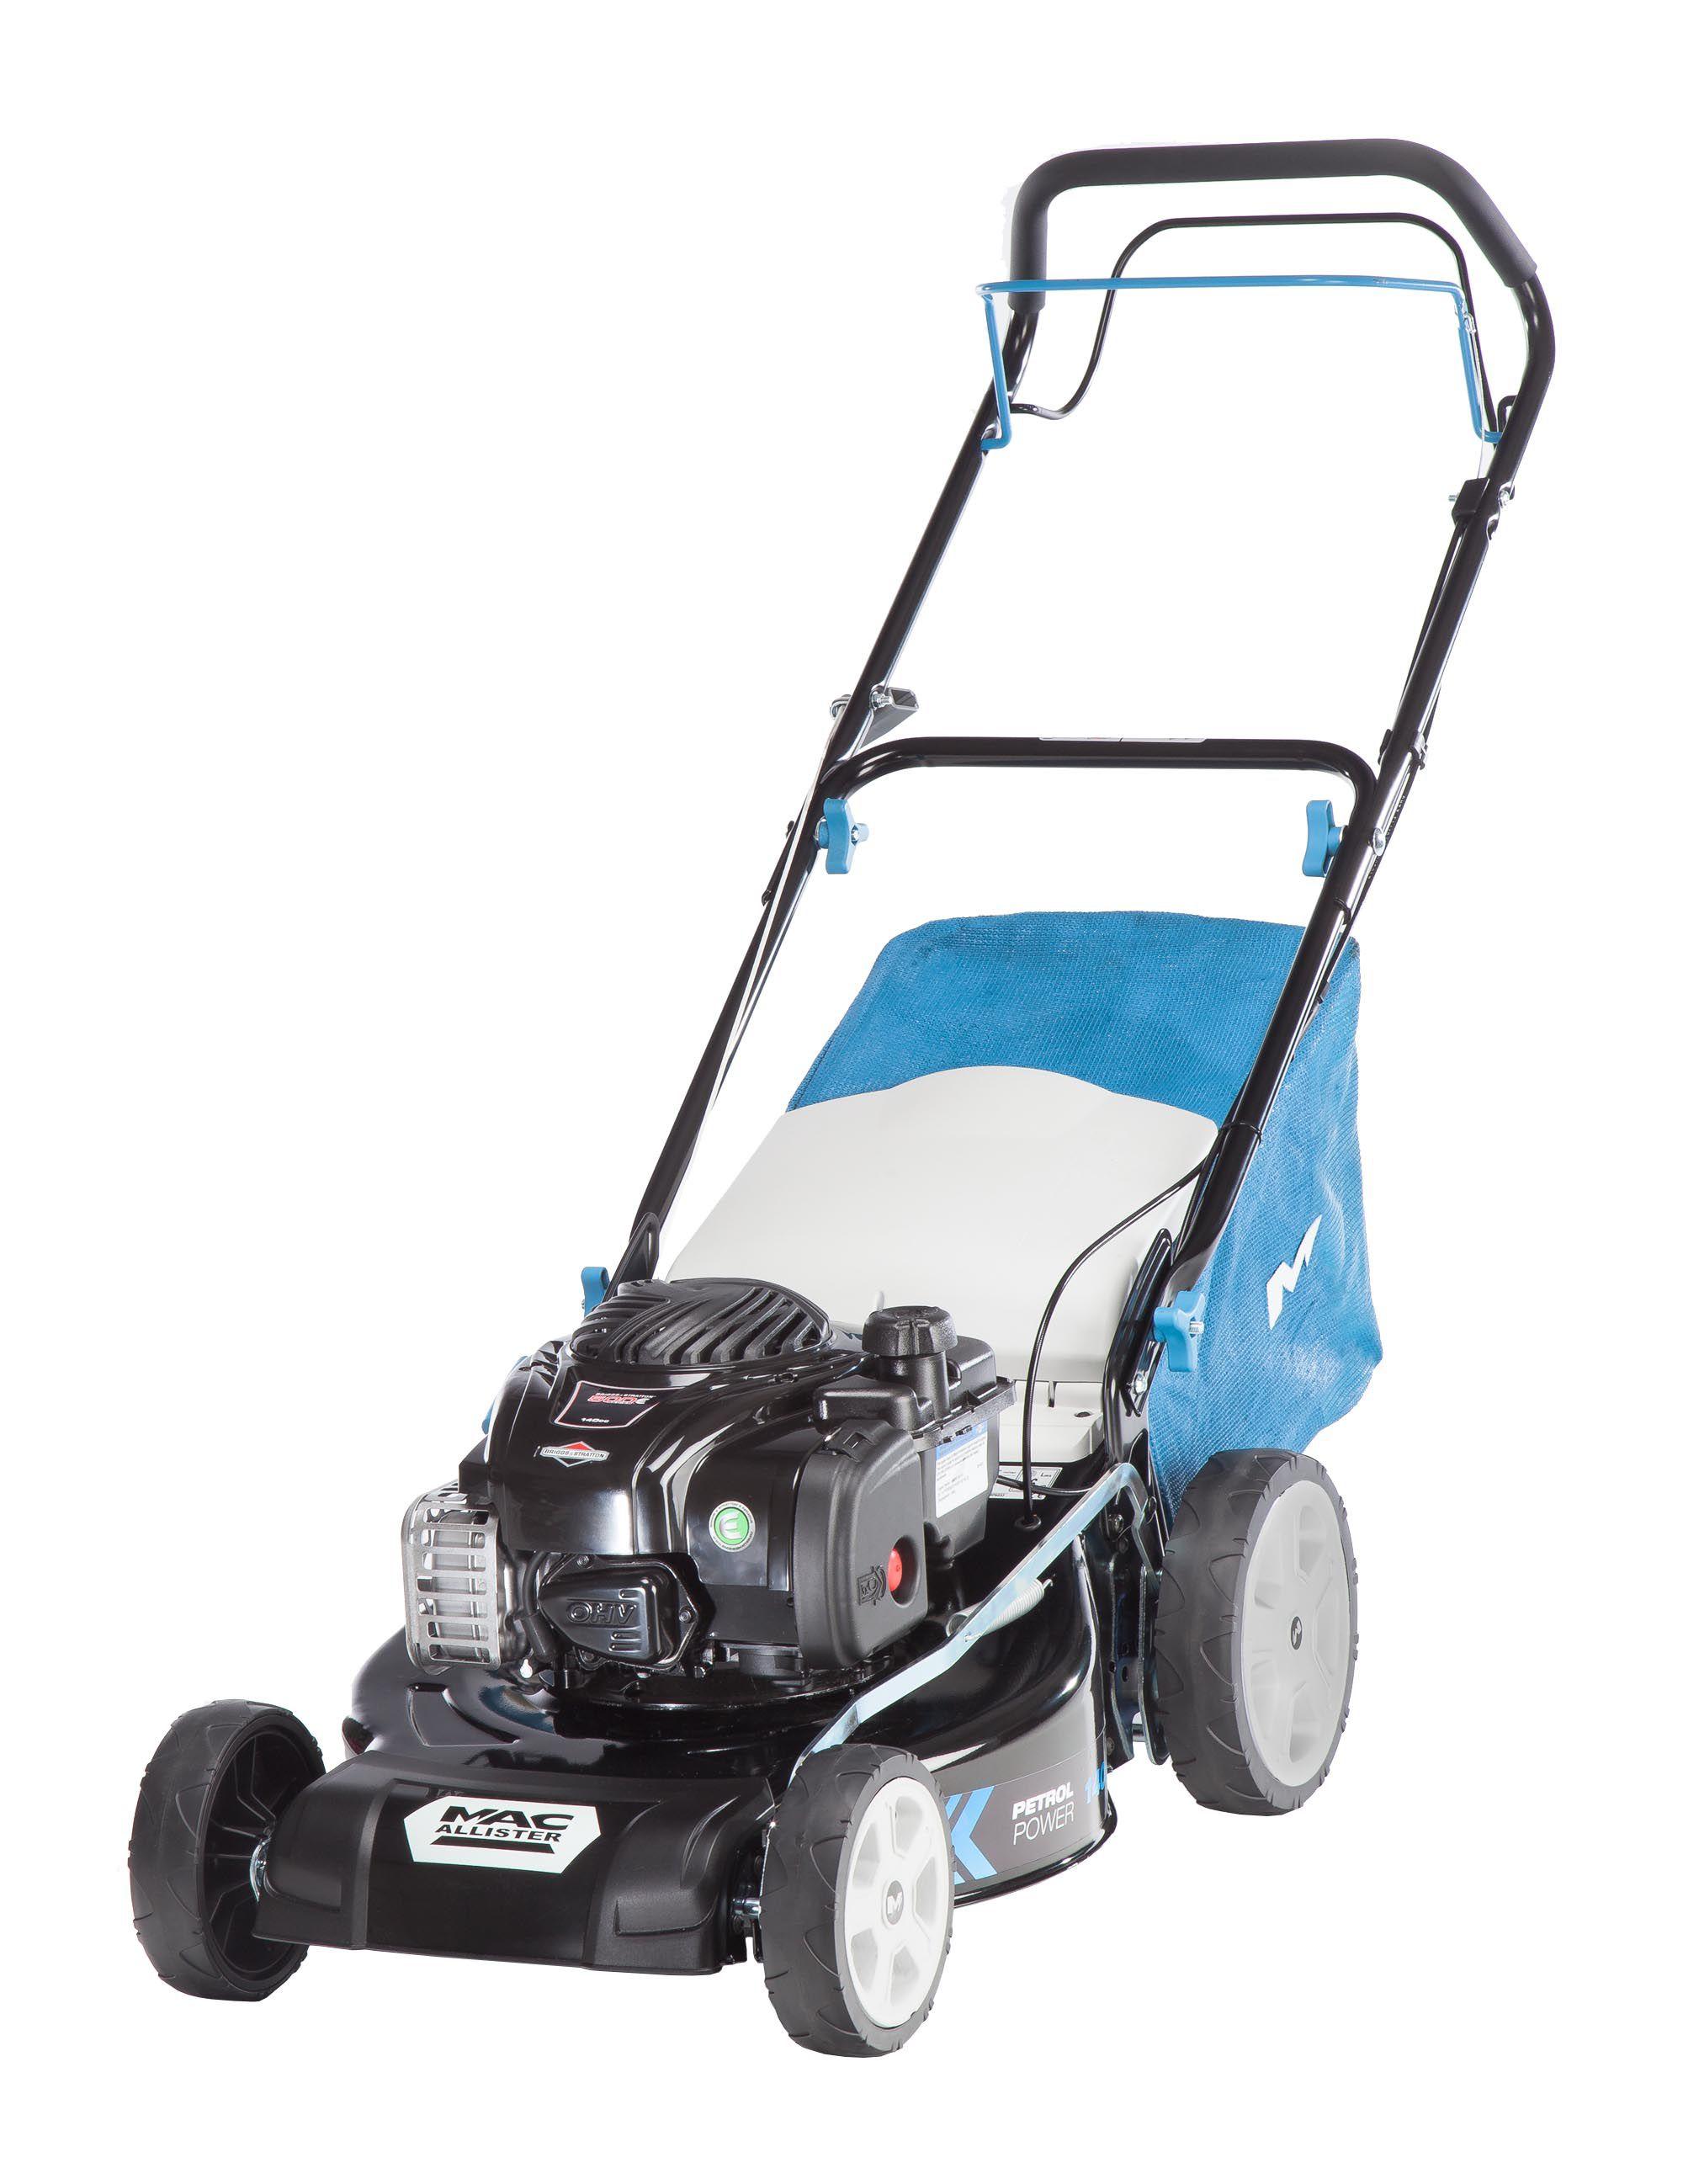 mac allister mprm 46sp petrol lawnmower departments diy at b q. Black Bedroom Furniture Sets. Home Design Ideas